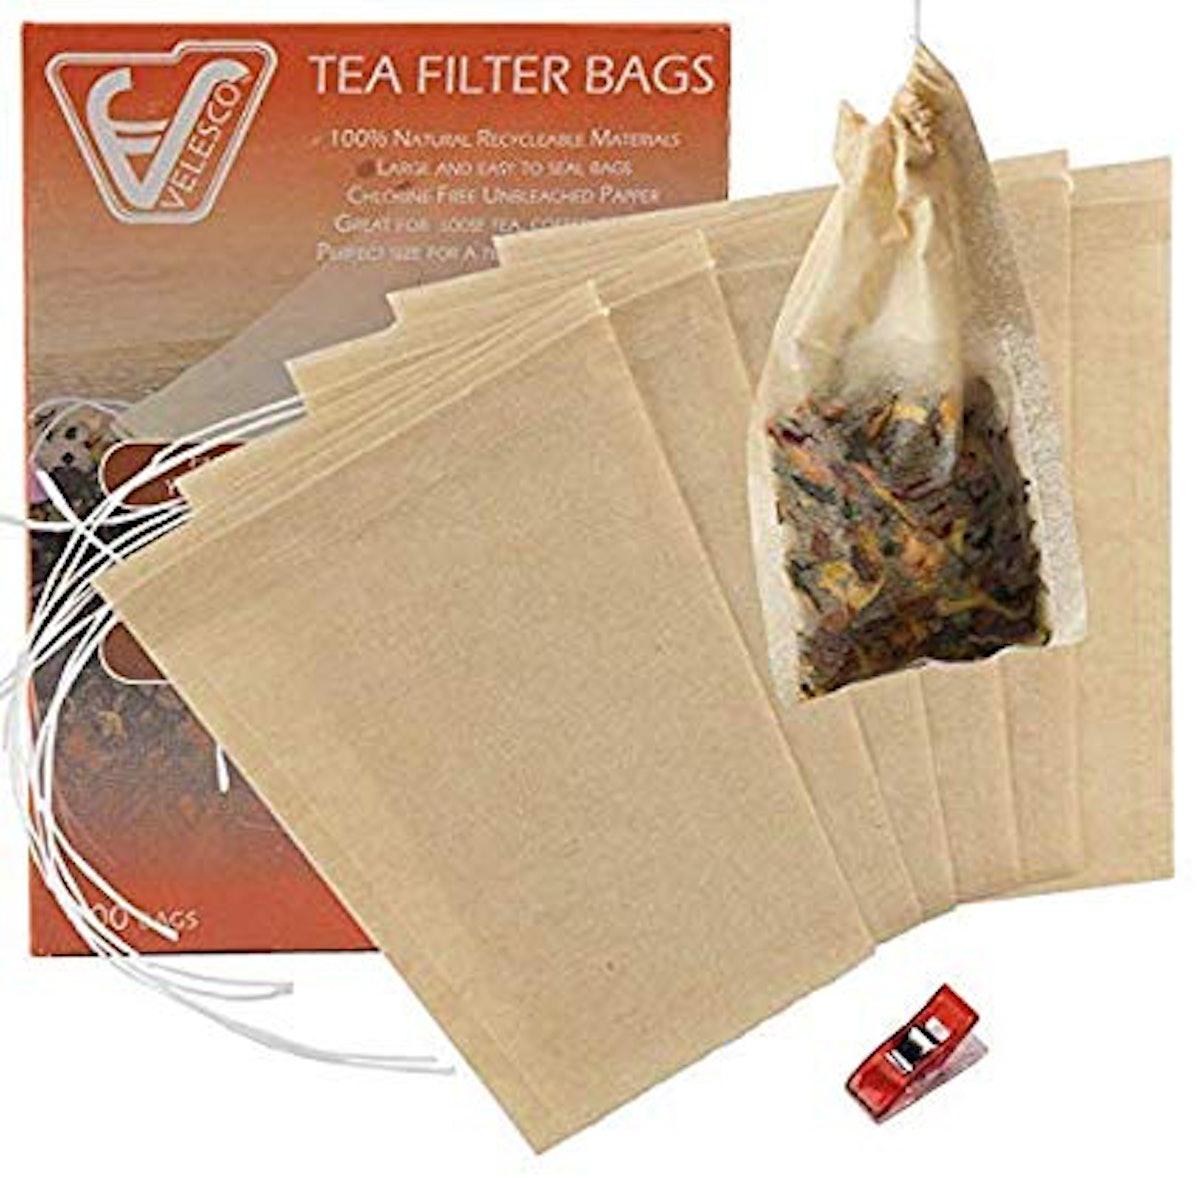 Velesco Tea Filter Bags Disposable Tea Infuser with Drawstring